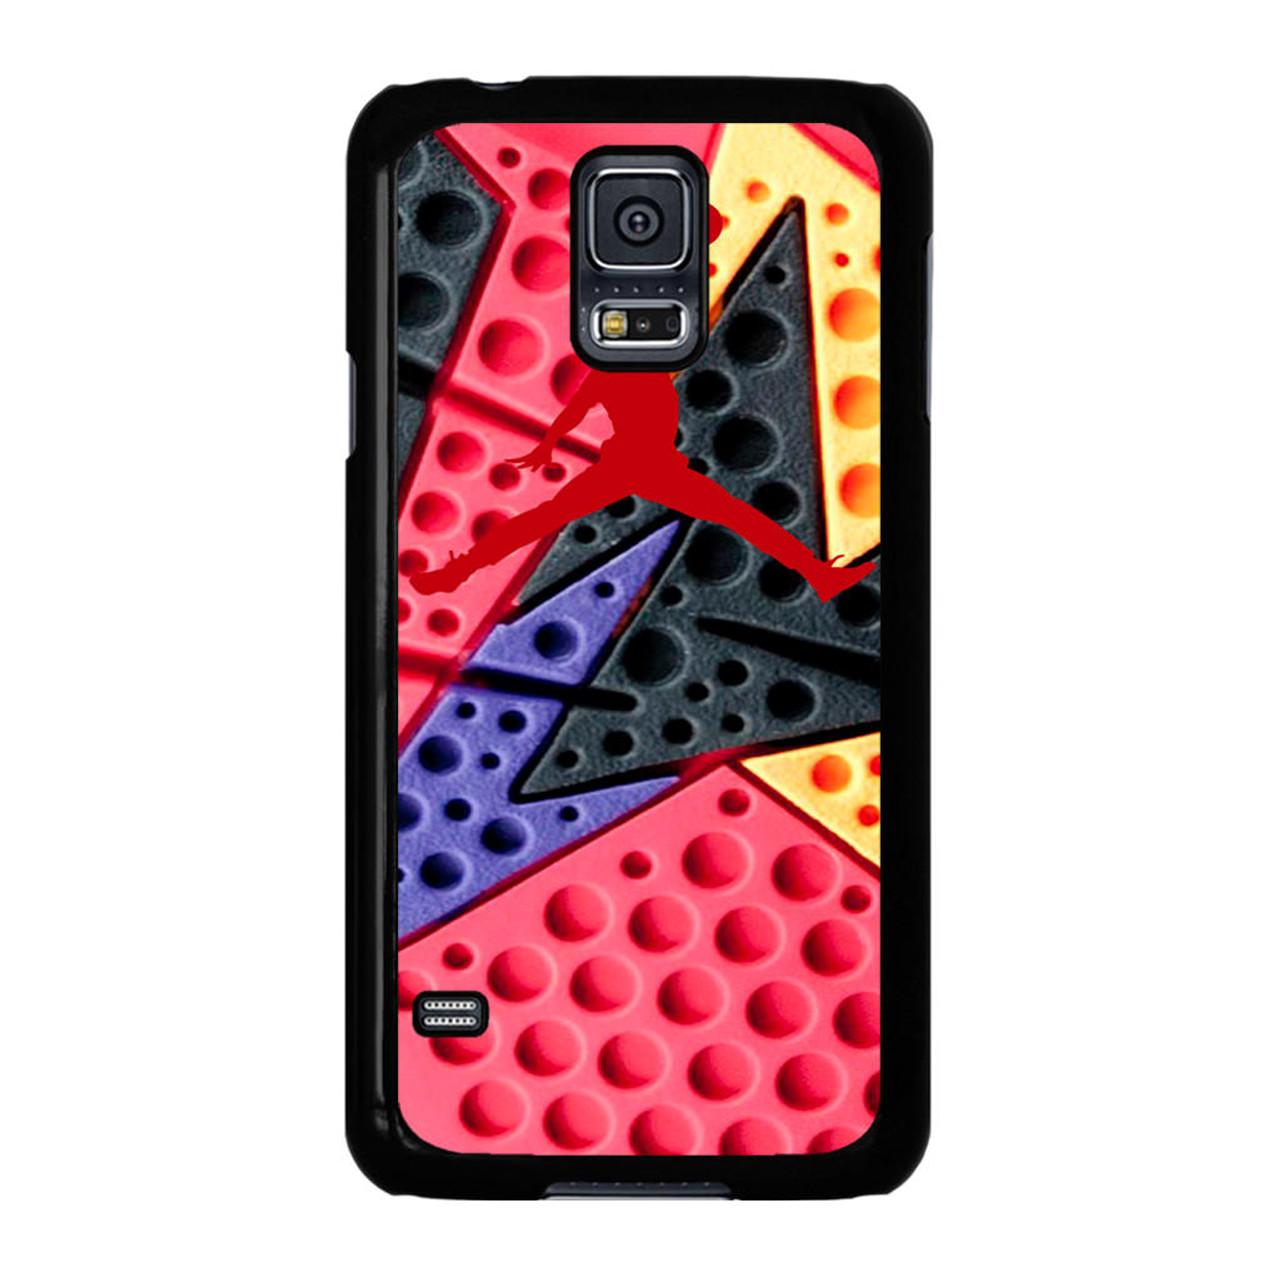 finest selection 6aac4 505f4 Jordan Retro 7 Raptors Print Samsung Galaxy S5 Case